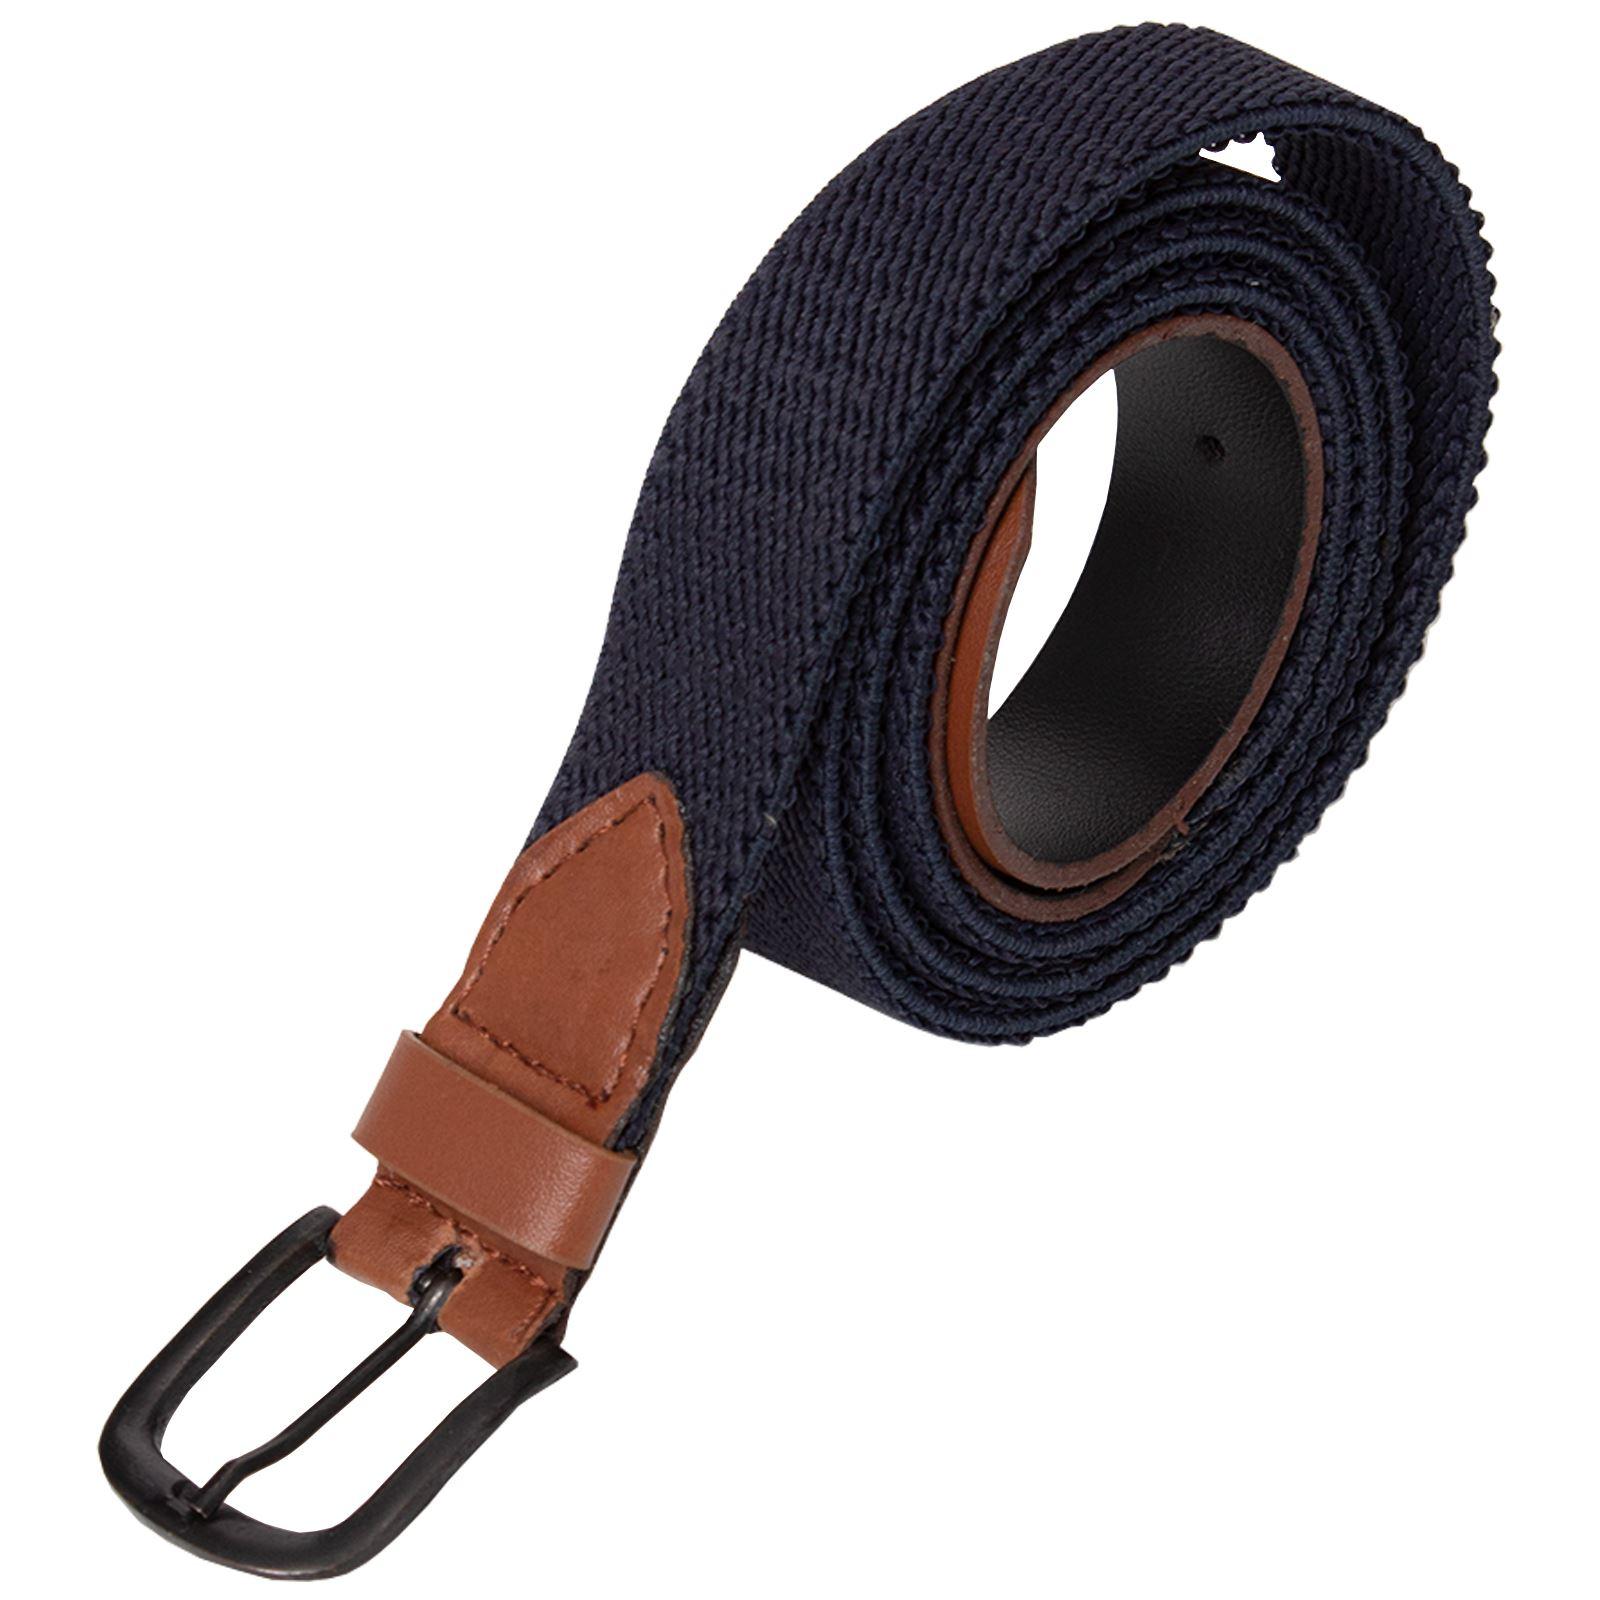 Mens-Ladies-Elasticated-Webbing-Belts-PU-Leather-Trim-Stretch-Canvas-Buckle-Belt Indexbild 5